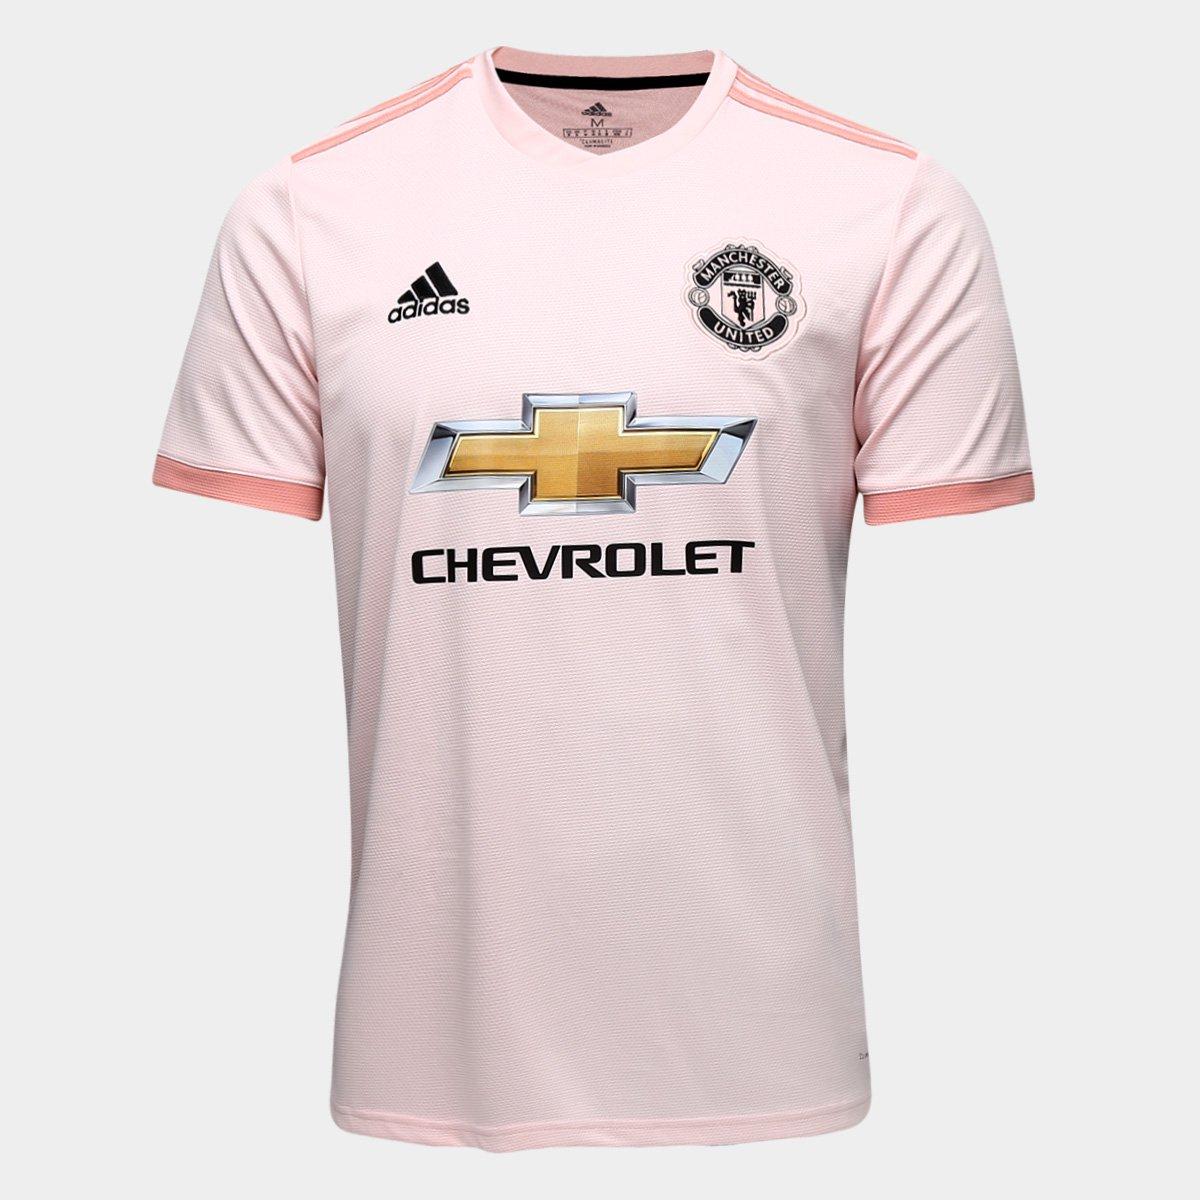 e4b1f3c8f8b02 Camisa Manchester United Away 2018 s/n° - Torcedor Adidas Masculina |  Allianz Parque Shop